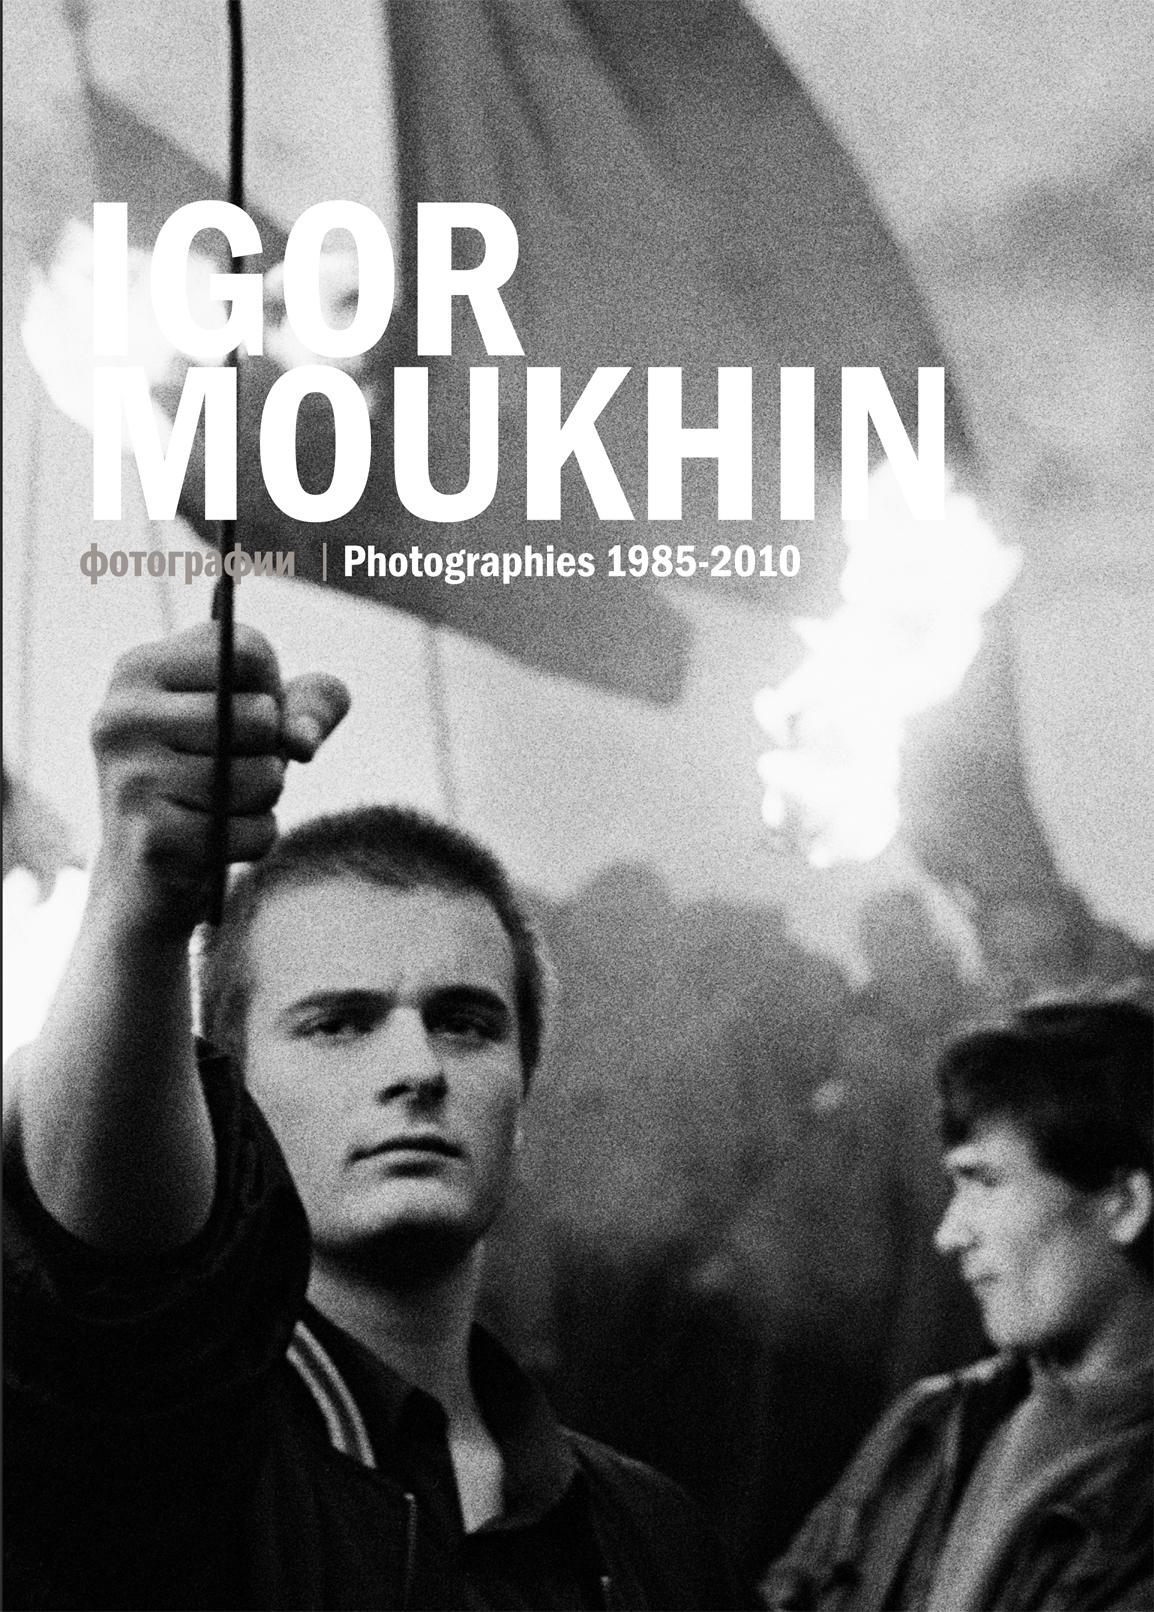 IGOR MOUKHIN - PHOTOGRAPHIES 1985 - 2010